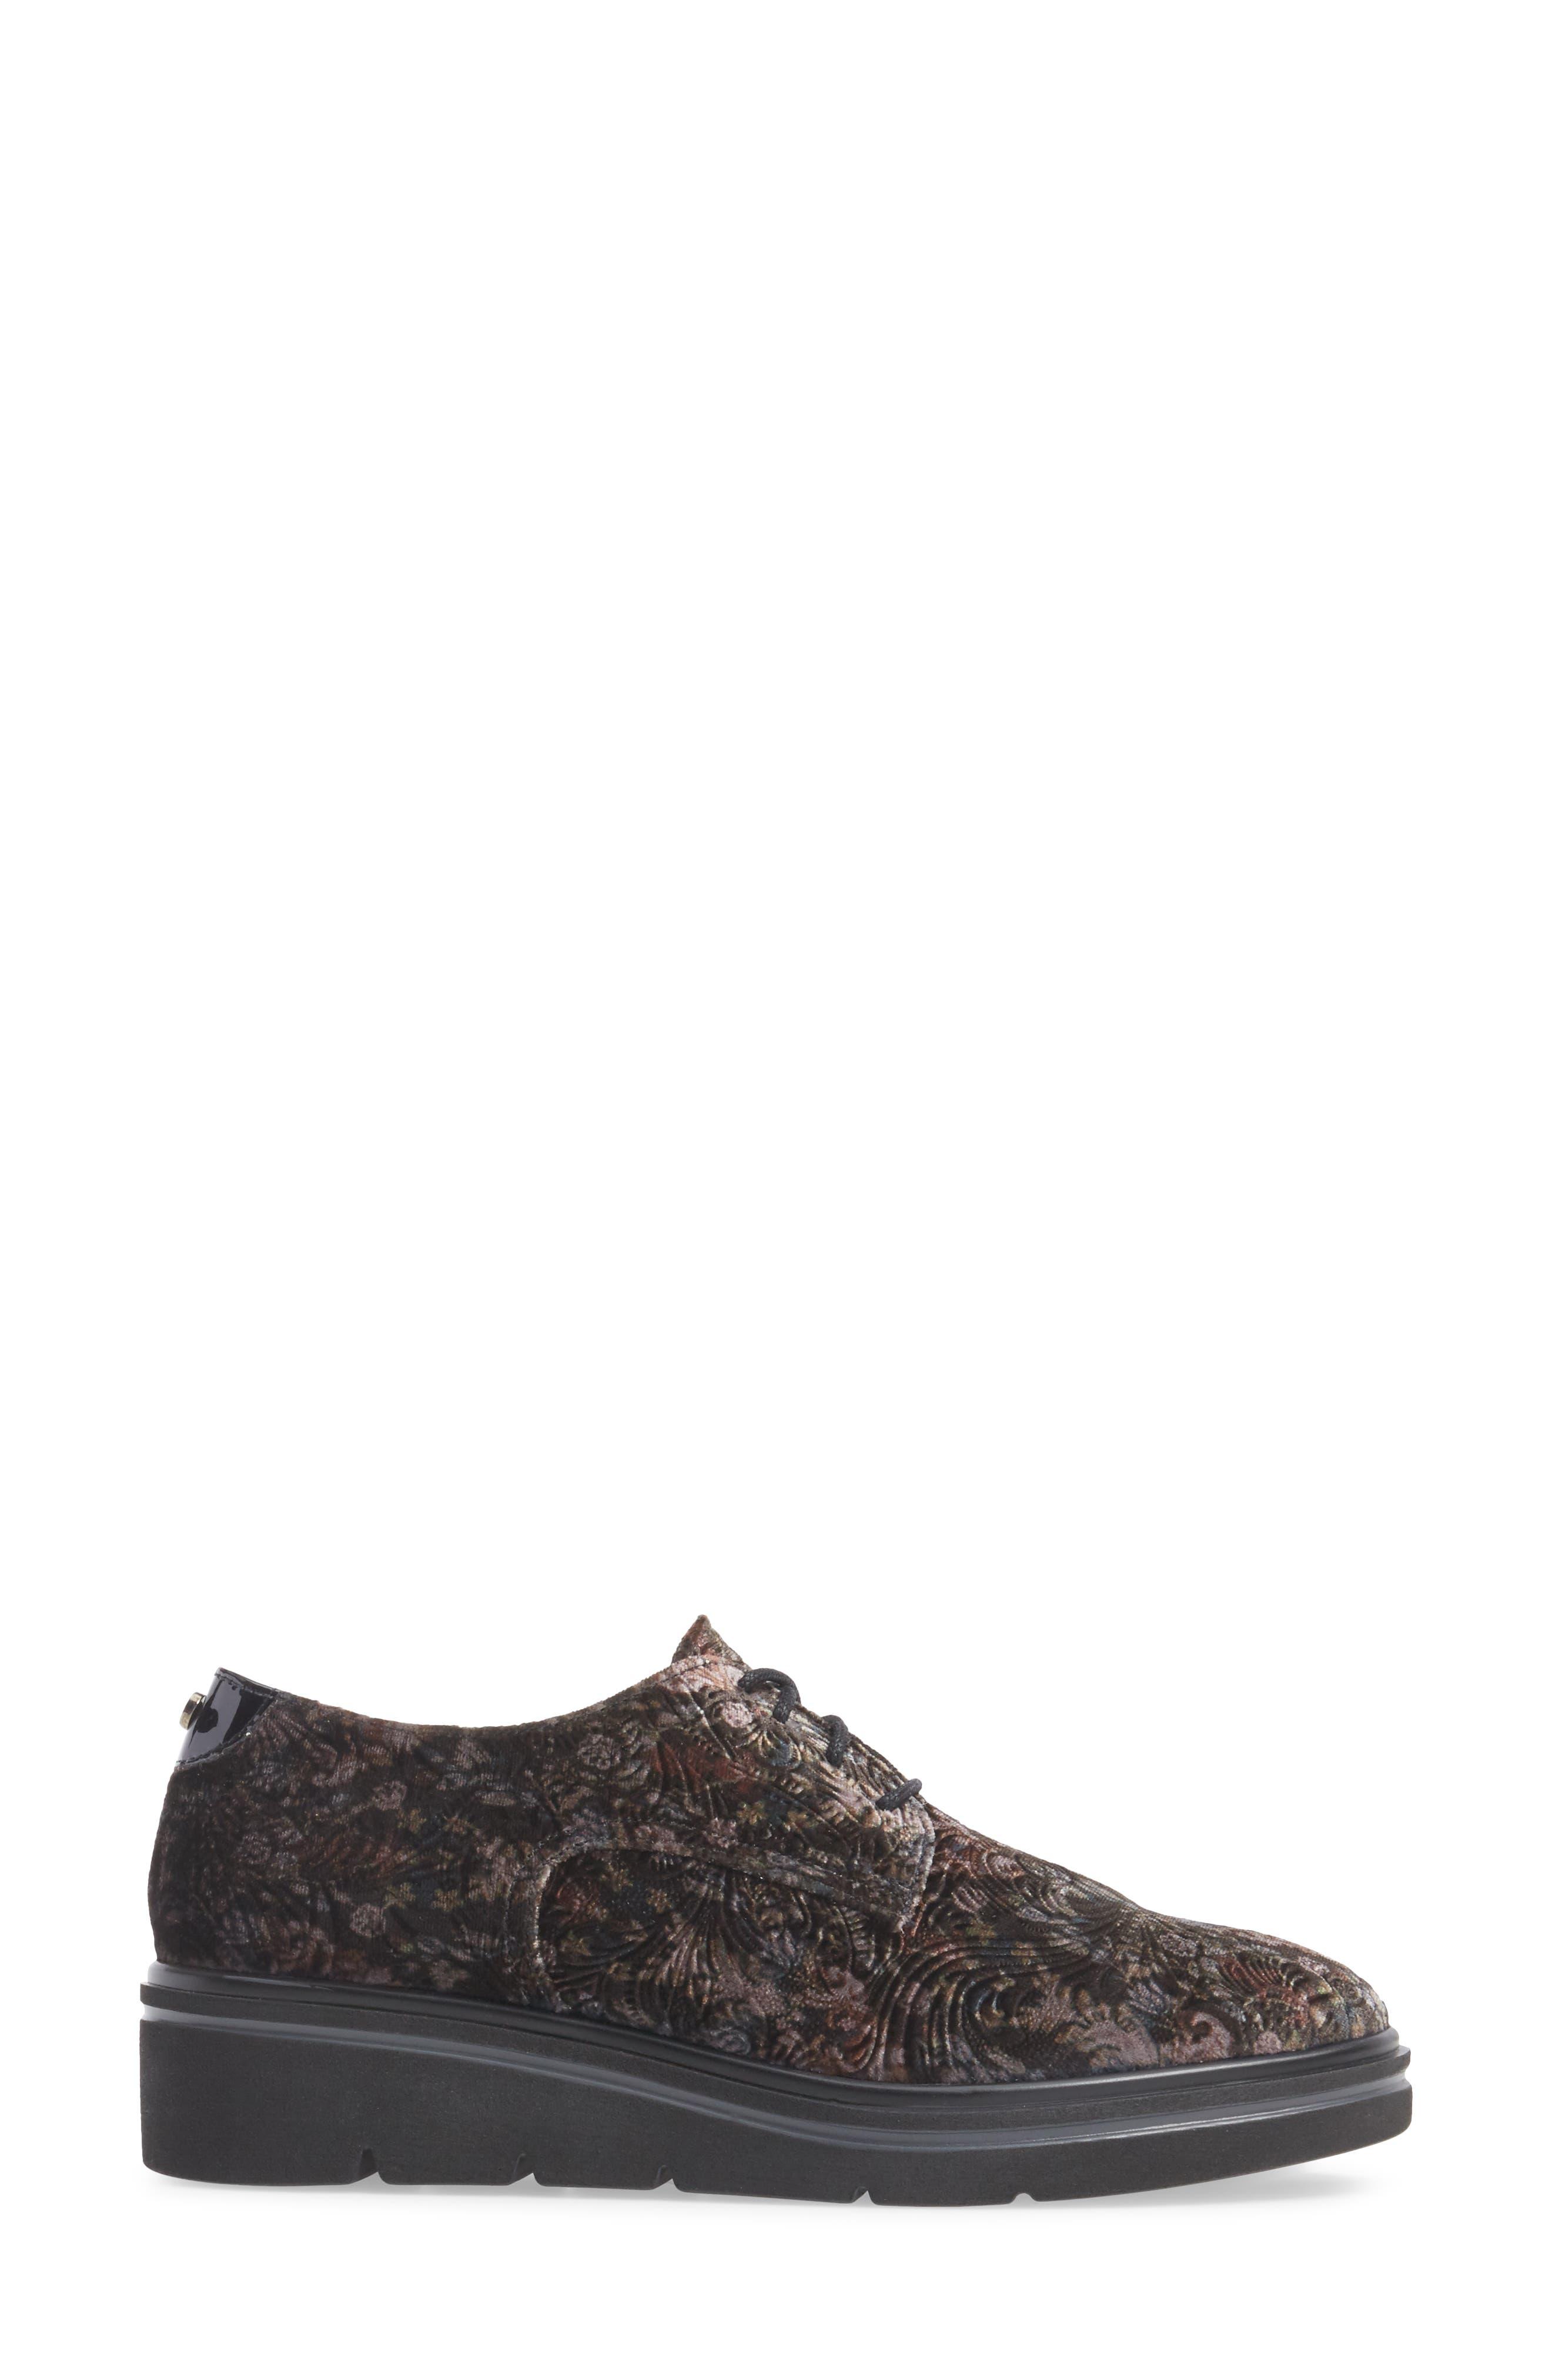 HISPANITAS, Richelle Oxford Sneaker, Alternate thumbnail 3, color, GREY FABRIC